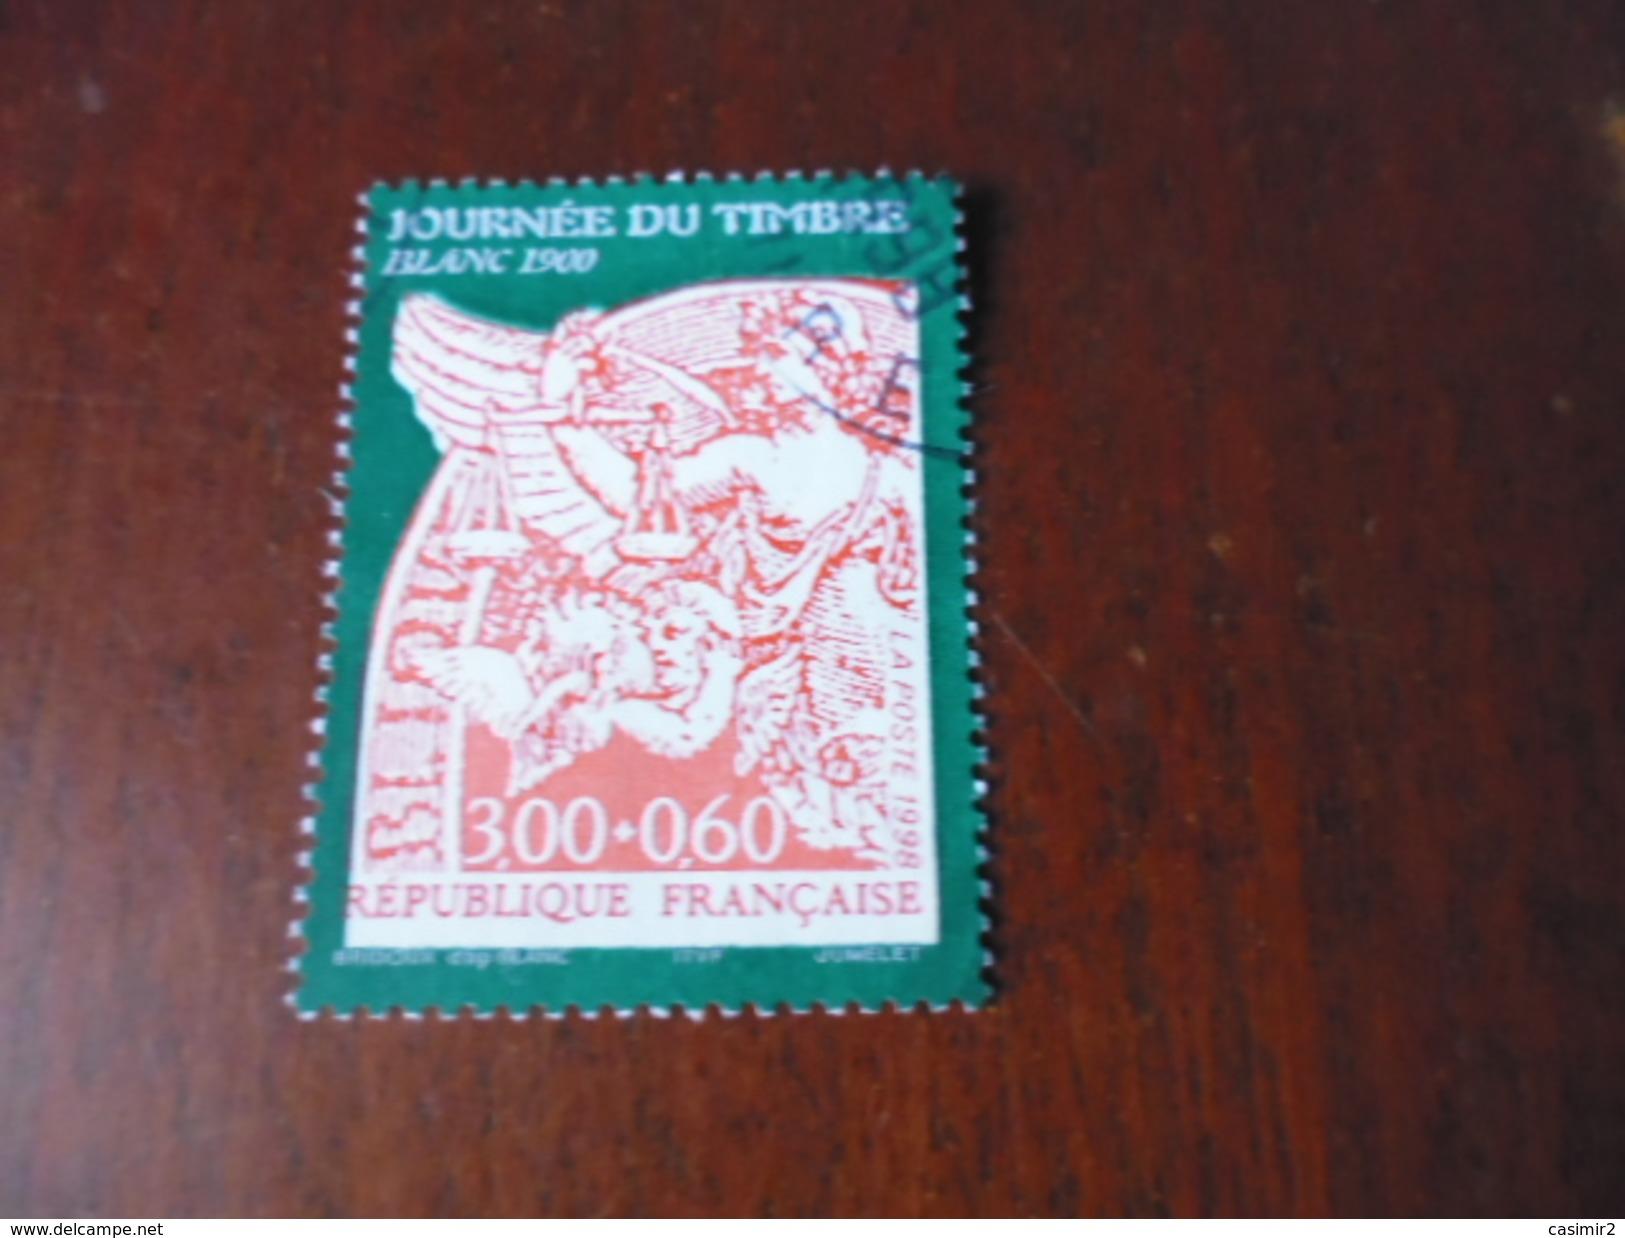 FRANCE Obliteration Choisie  YVERT N° 3135 - Used Stamps